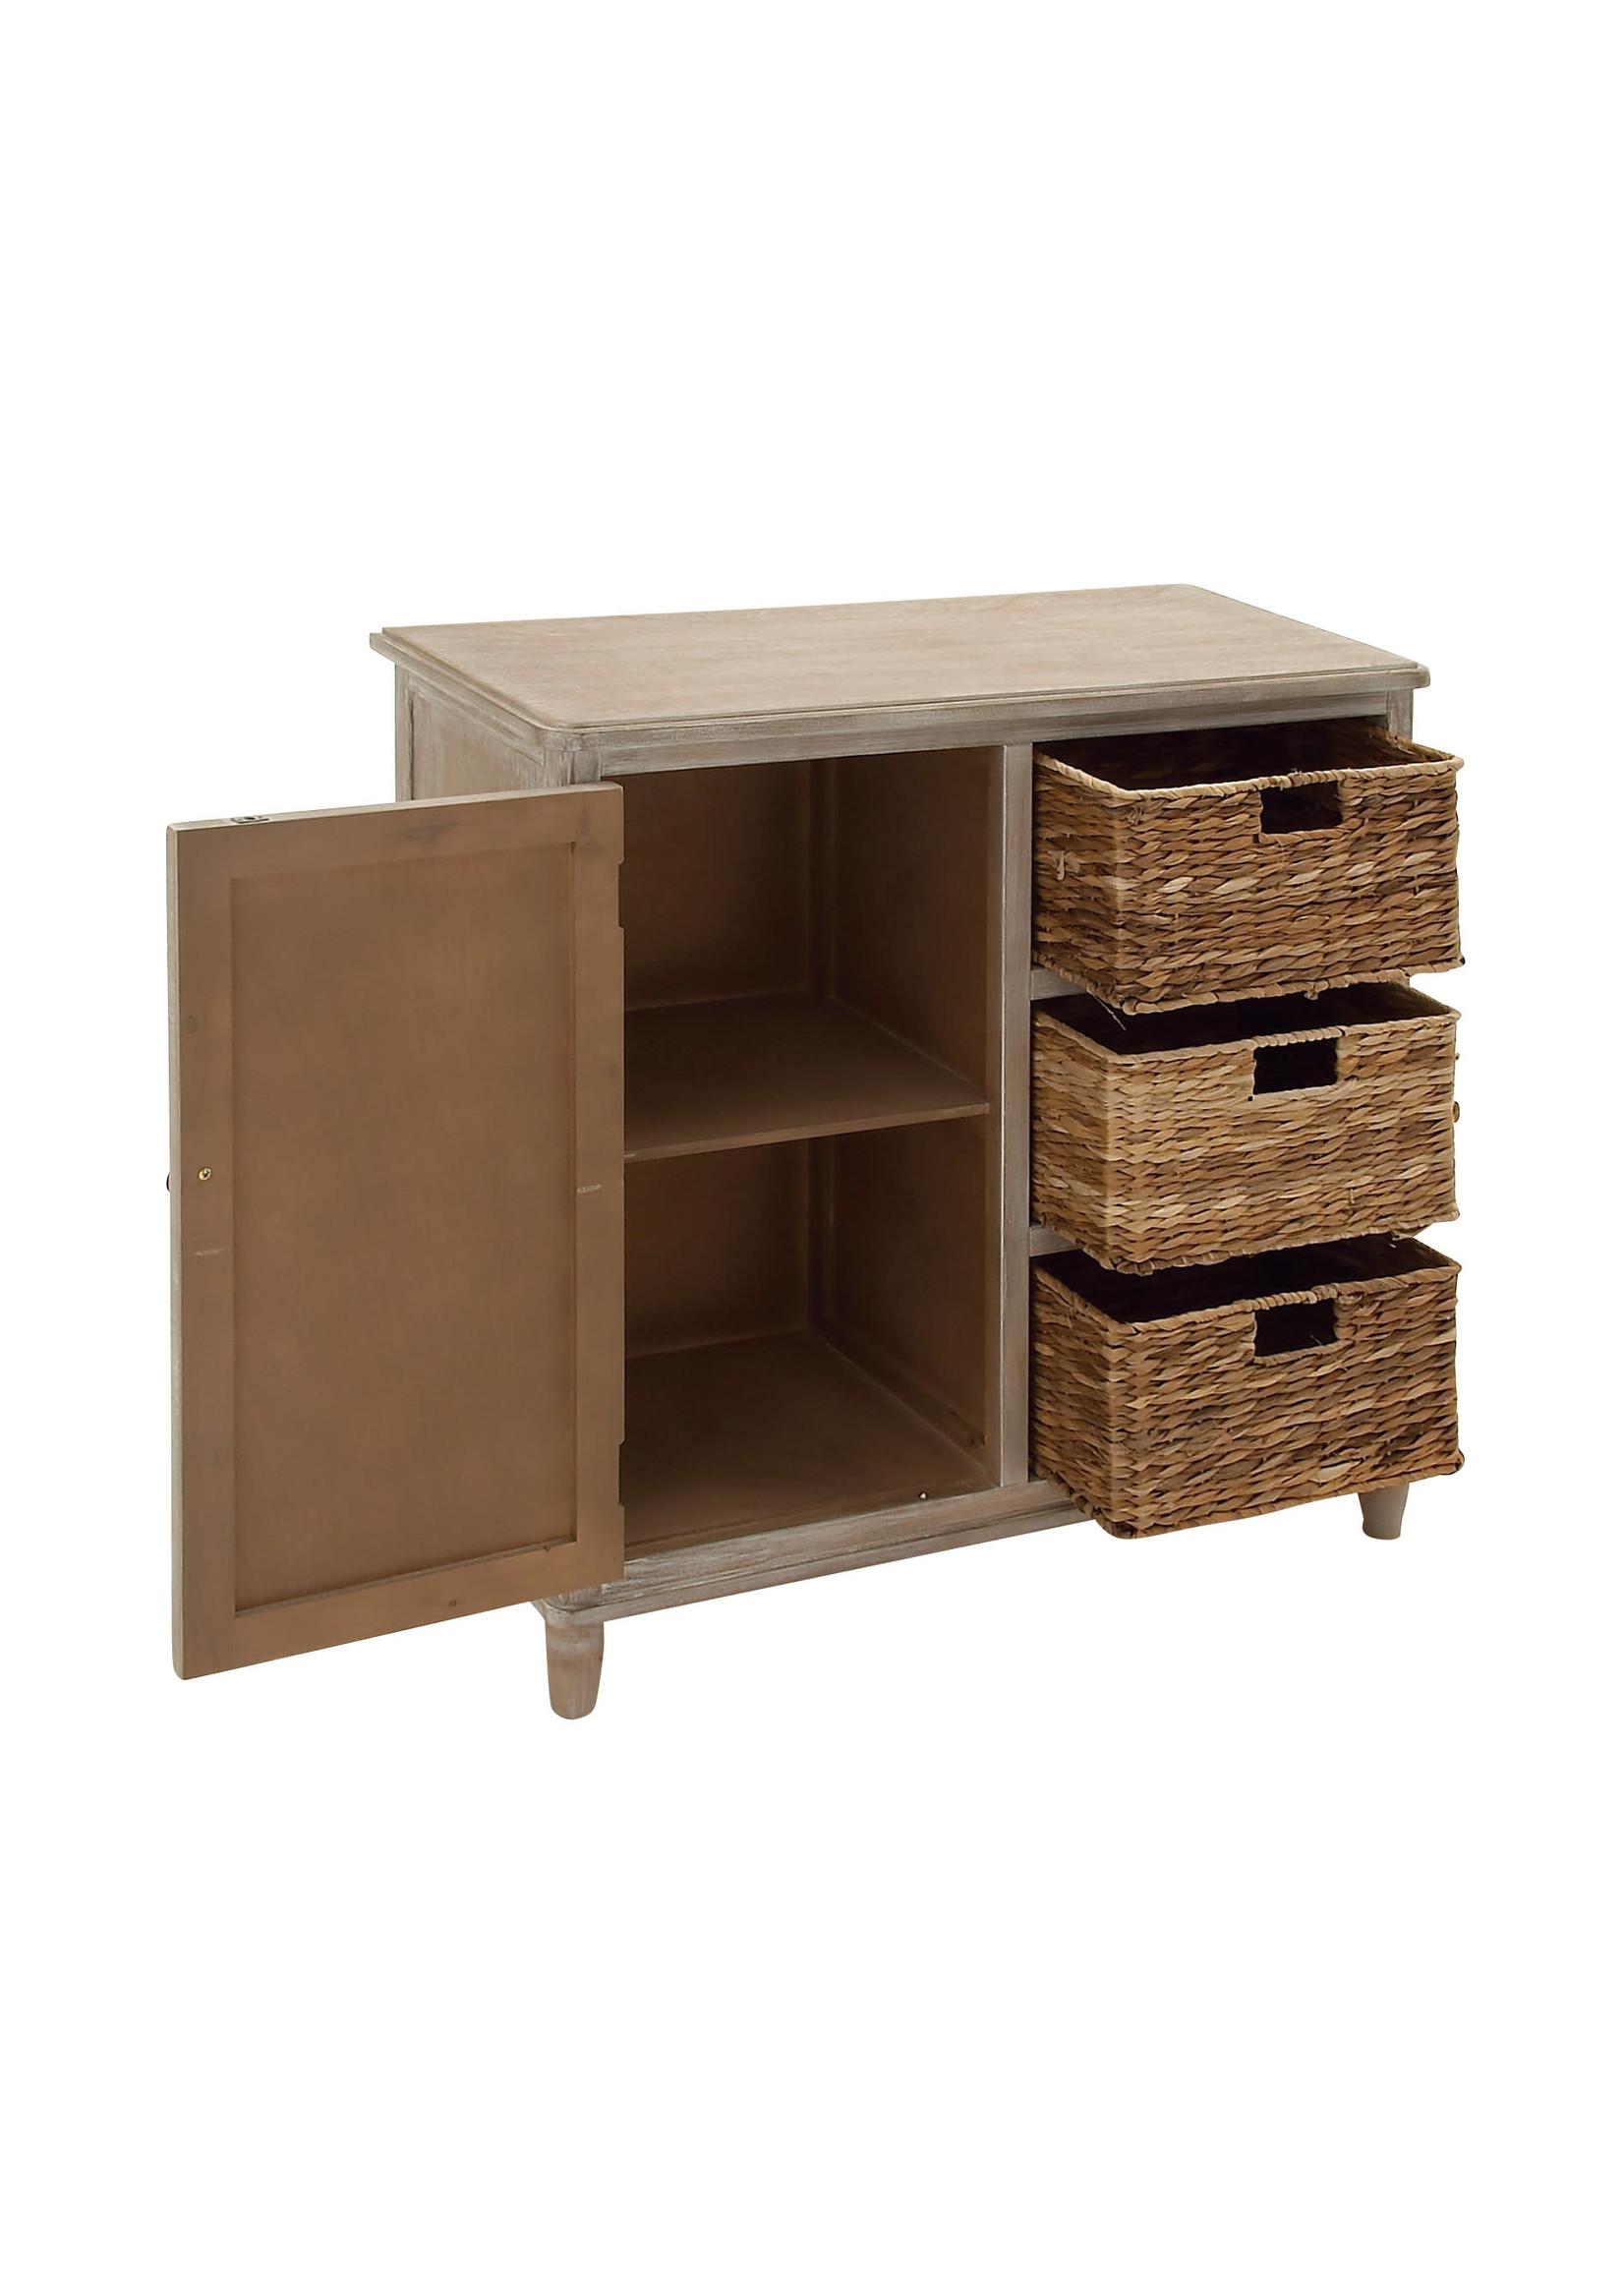 UMA Enterprises Wood Basket Cabinet